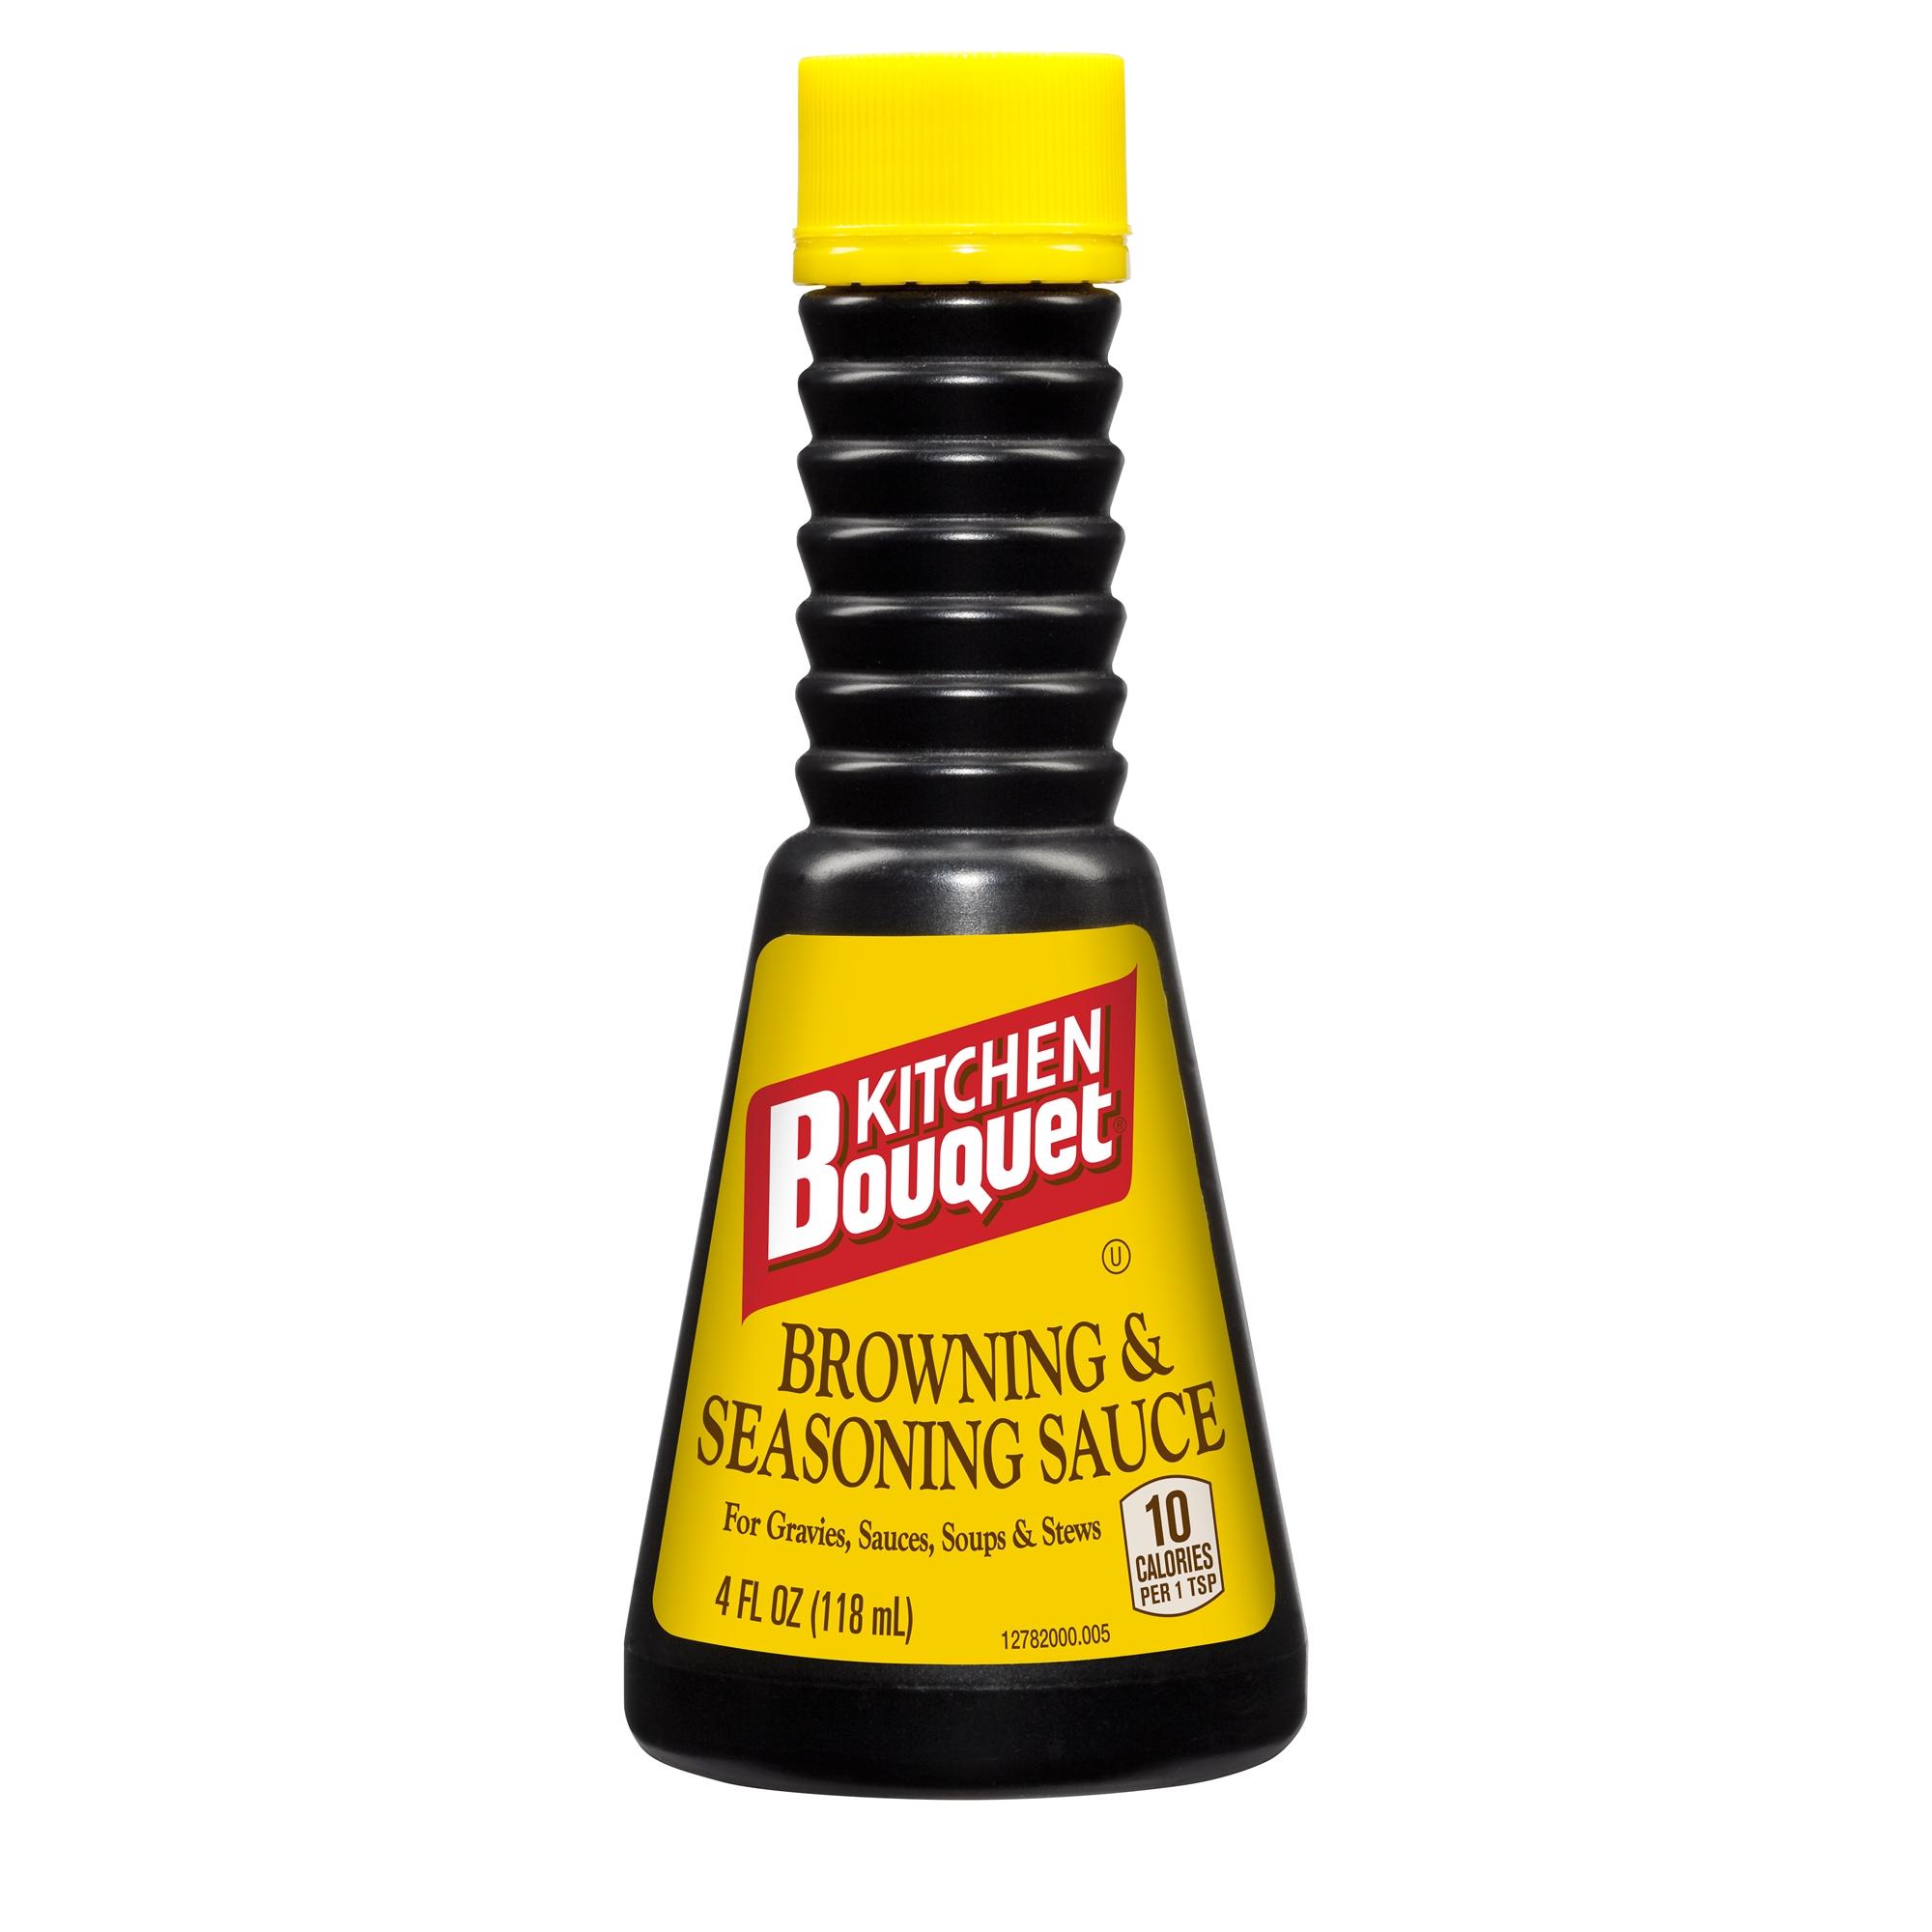 (2 Pack) Kitchen Bouquet Browning & Seasoning Sauce, 4 oz